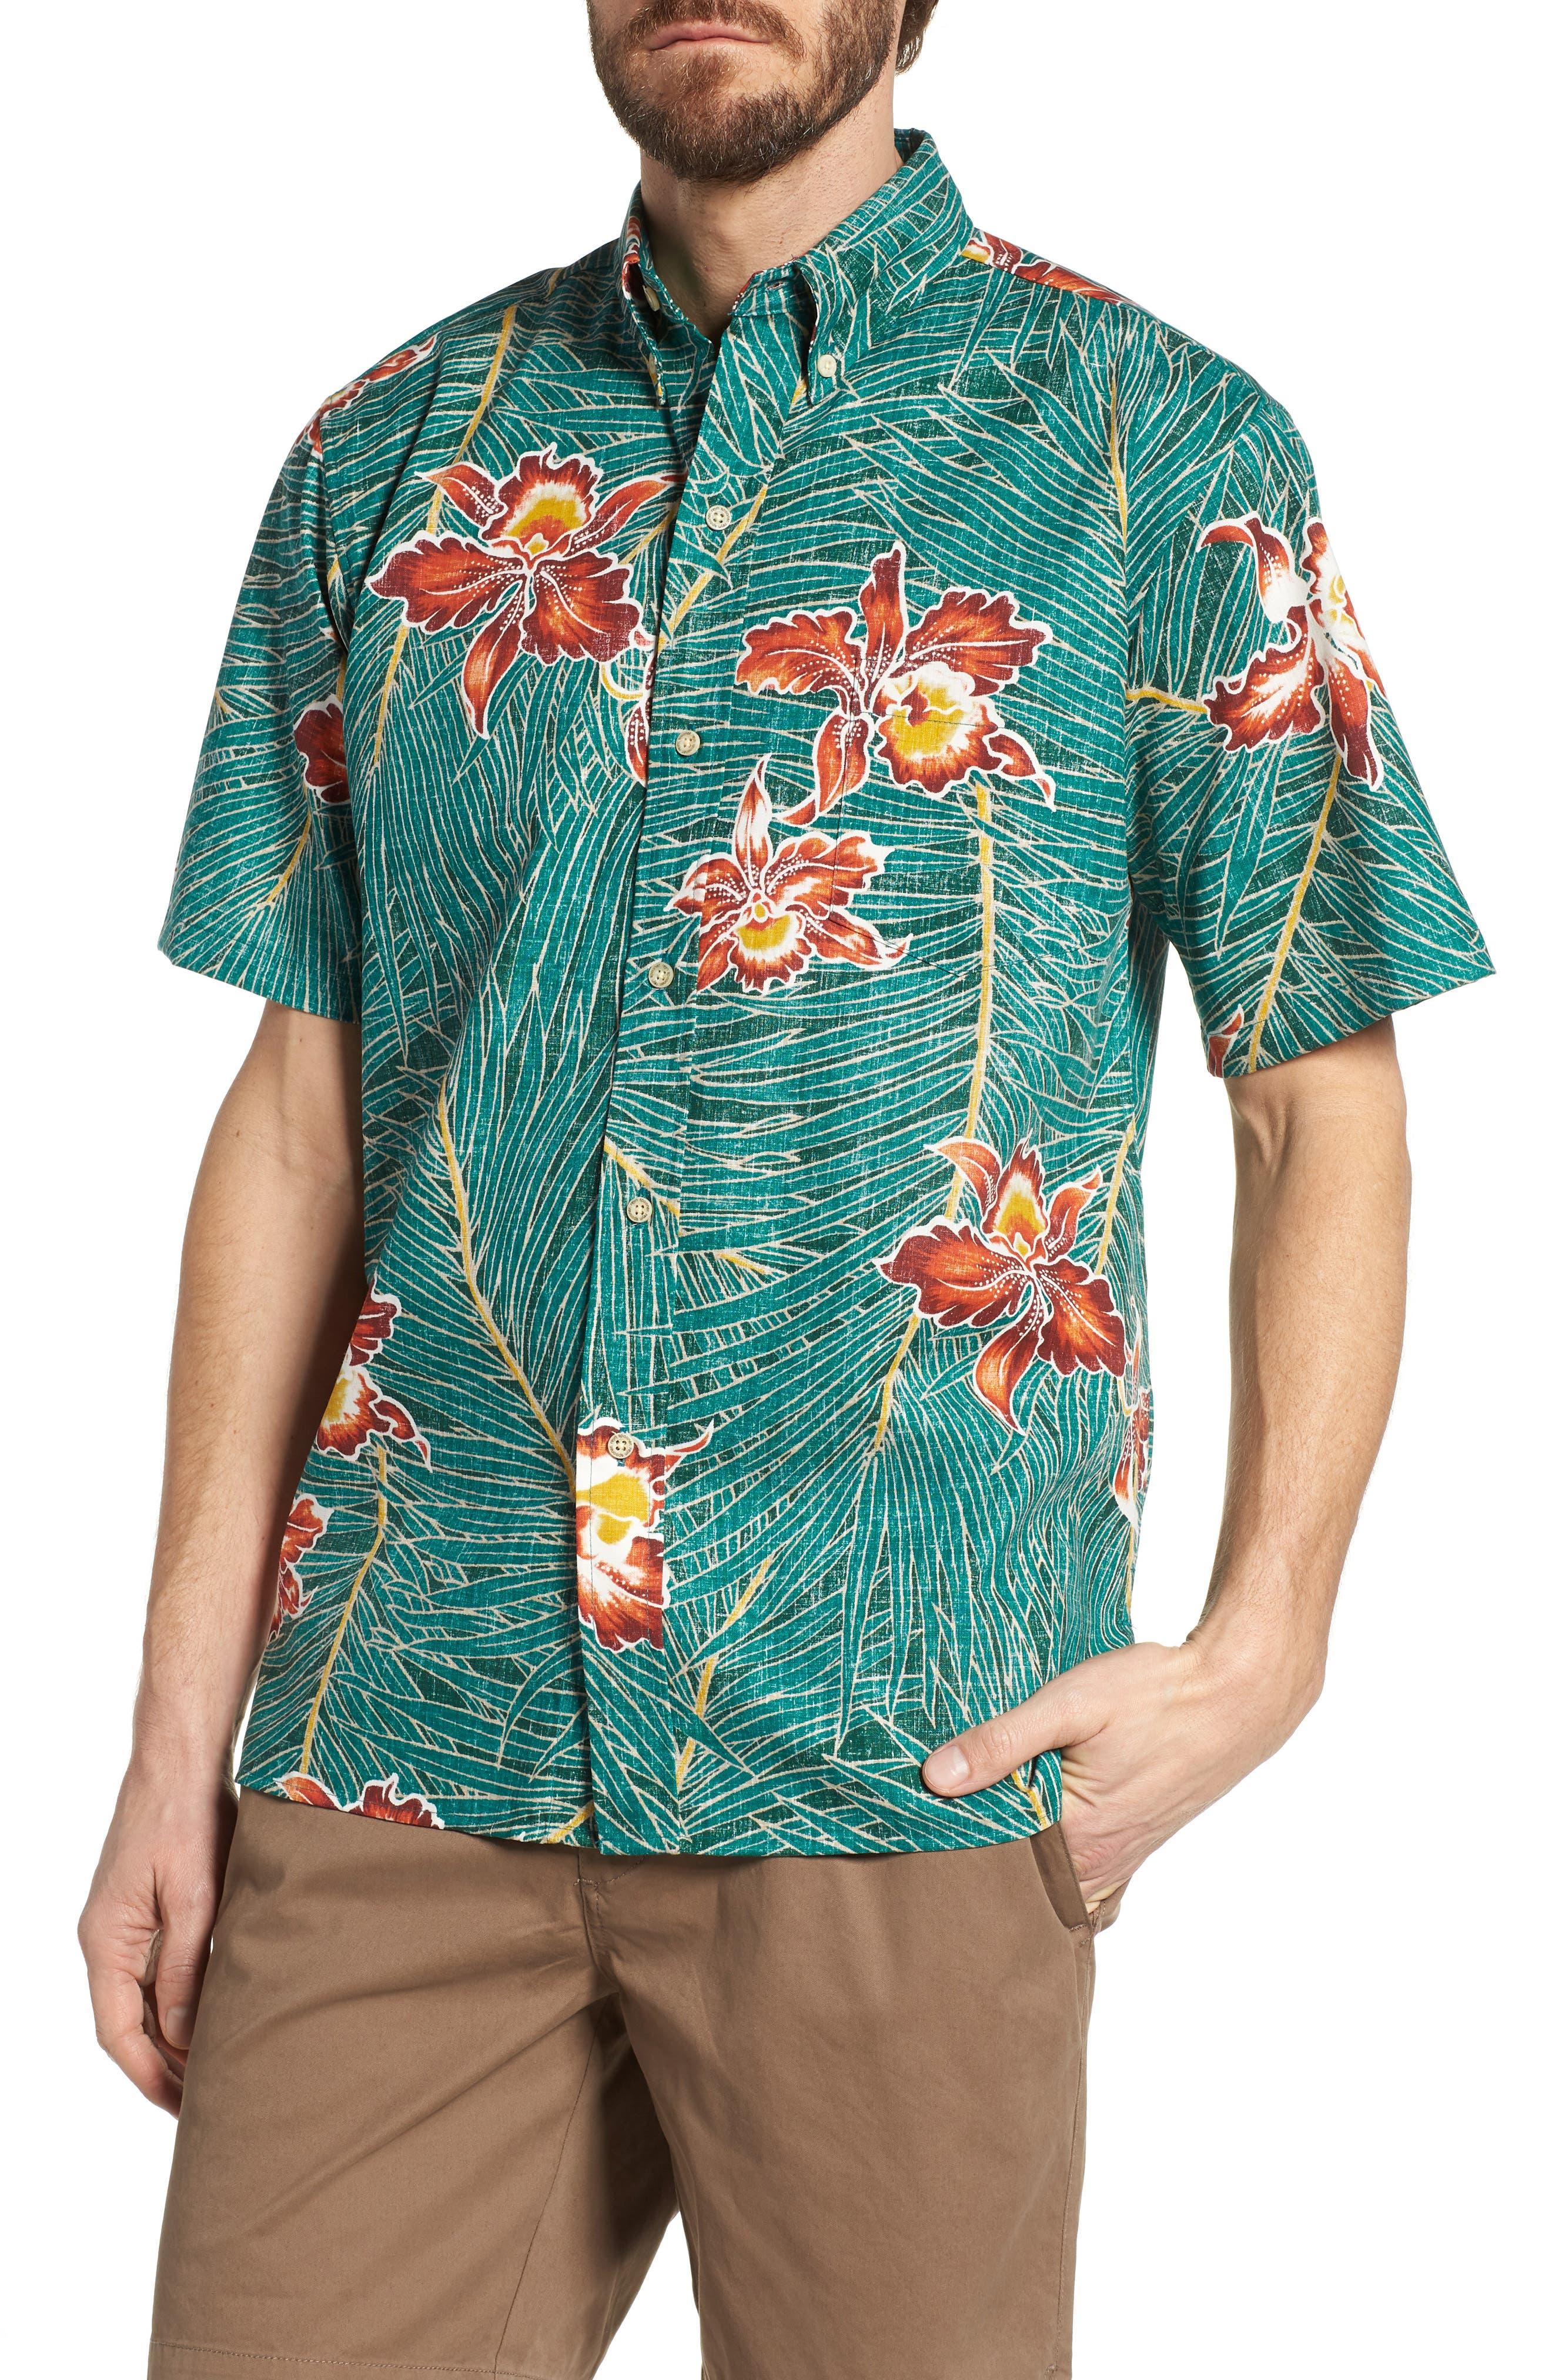 Okika Oasis Traditional Fit Sport Shirt,                             Main thumbnail 1, color,                             310